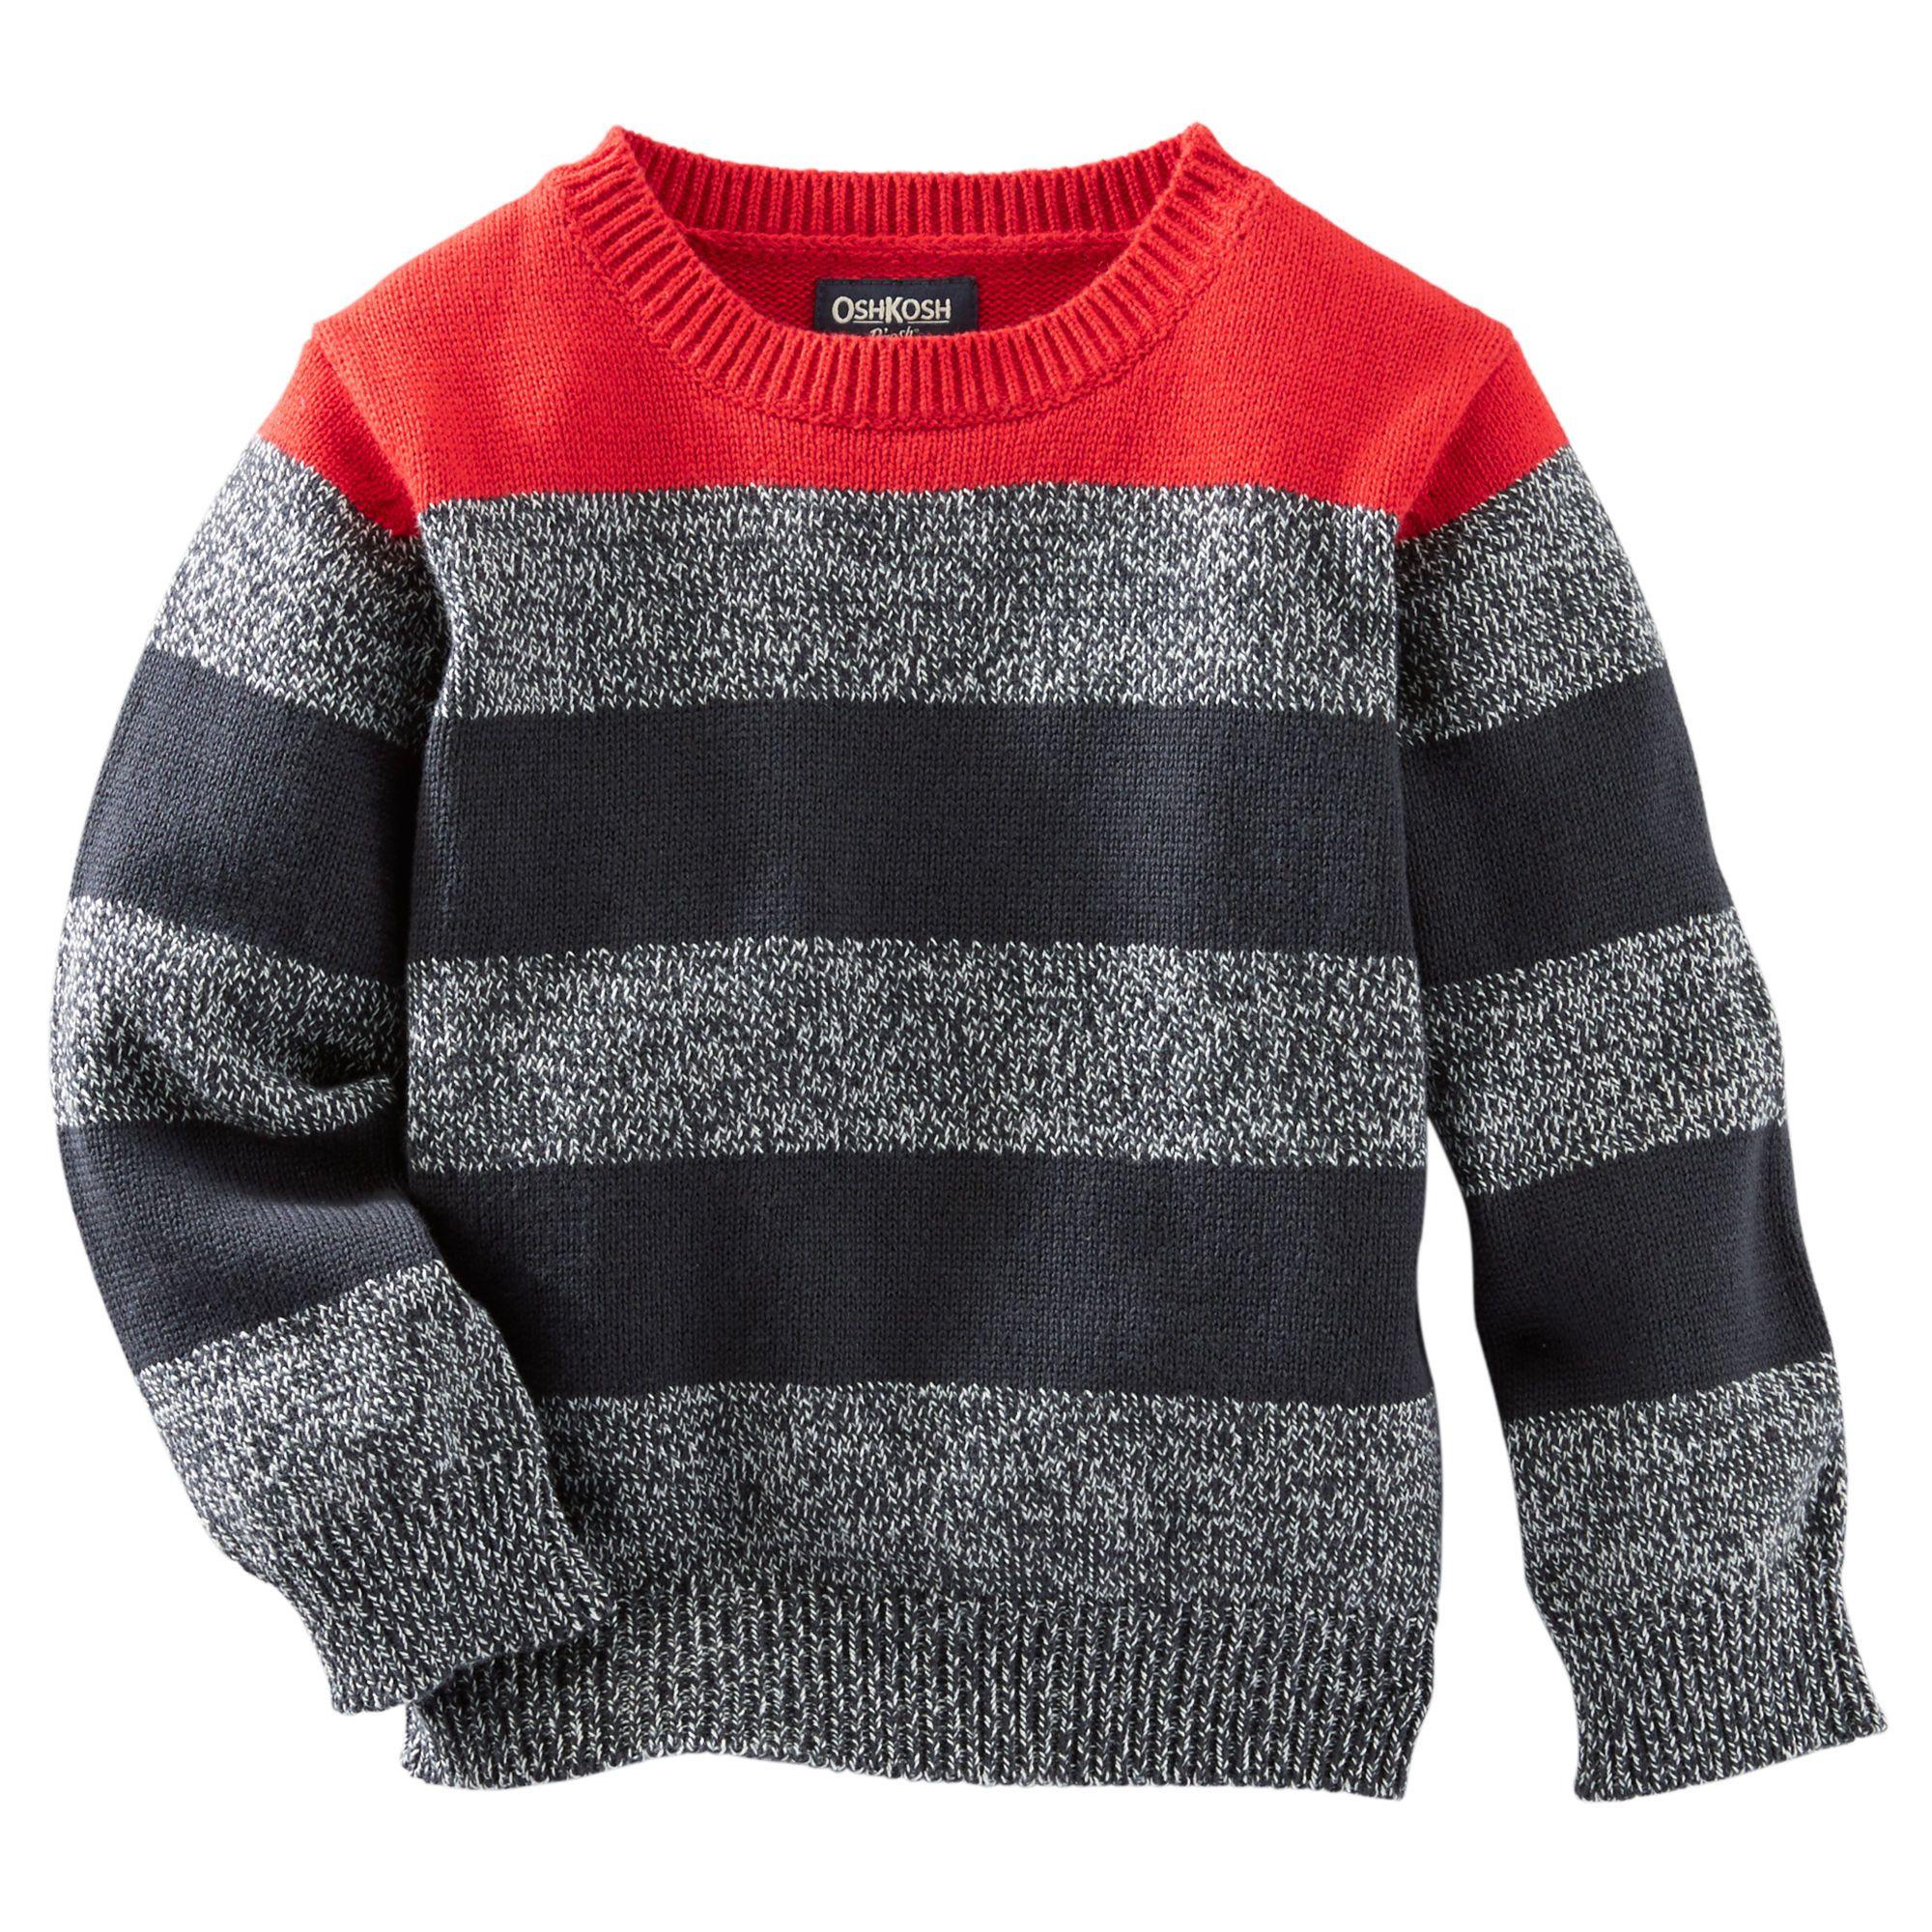 Ski Lodge Sweater | Tejido, Niños tejiendo y Suéteres